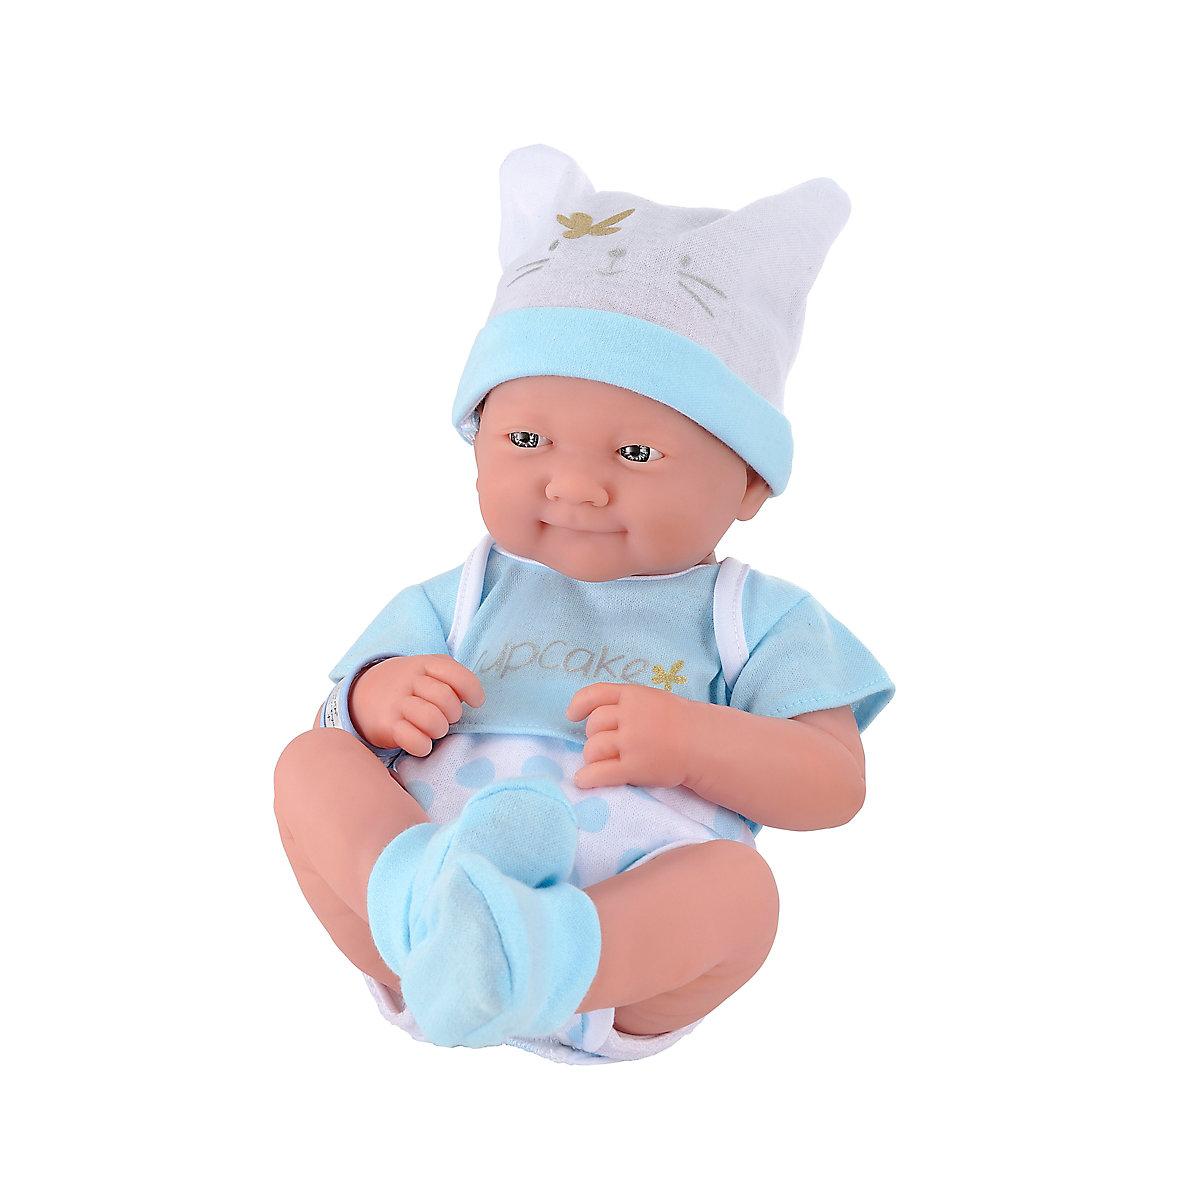 Cupcake Newborn Baby Boy Doll